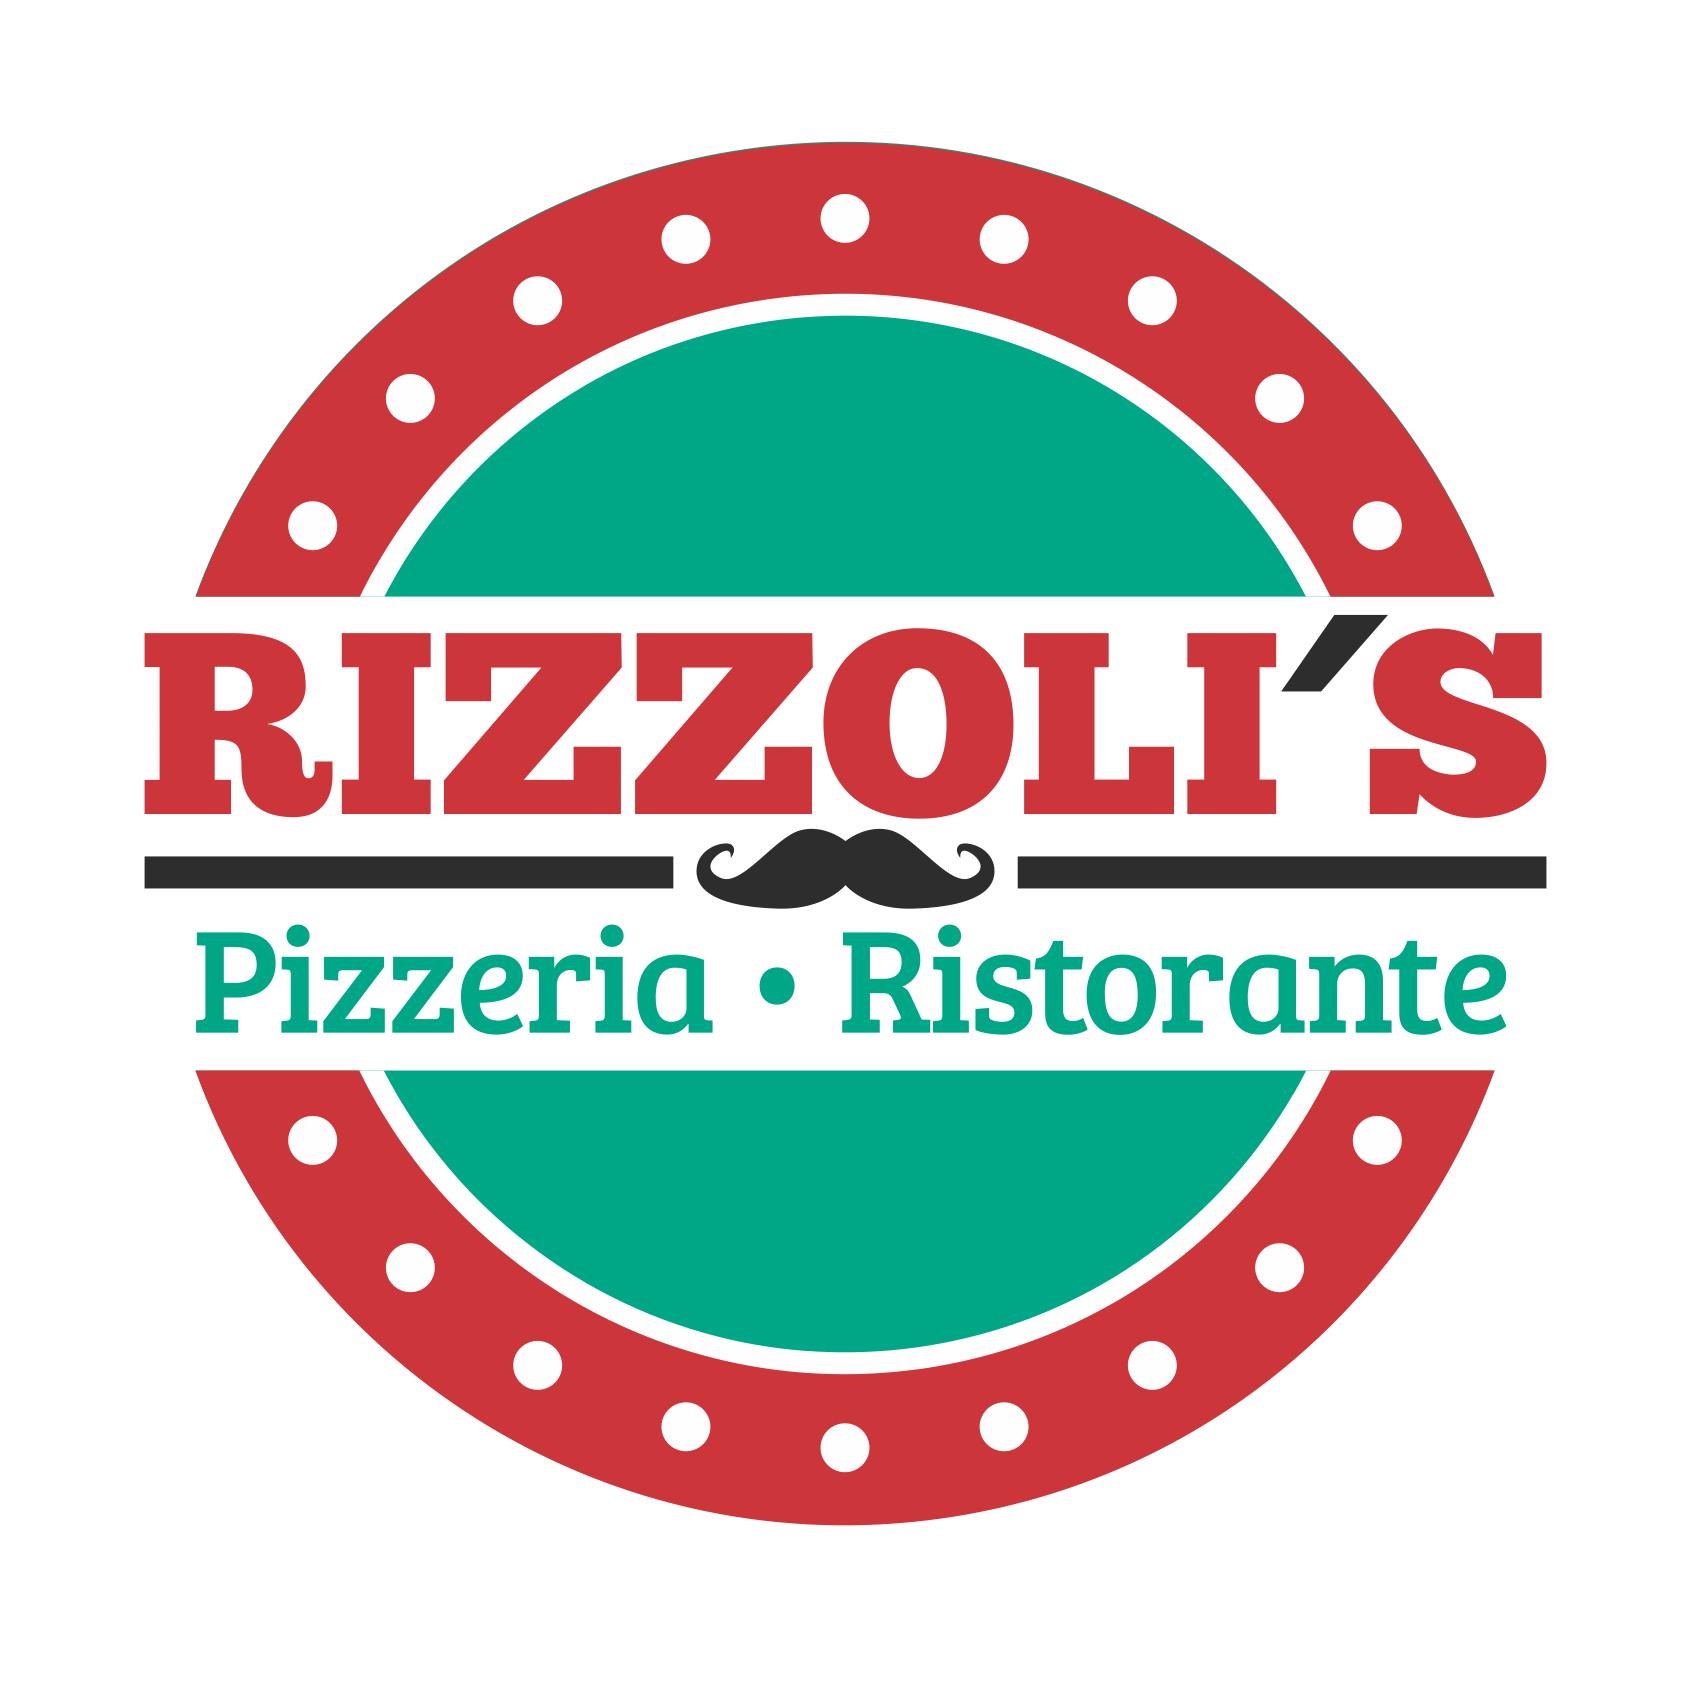 RIZZOLIS_LOGO ristorante.png